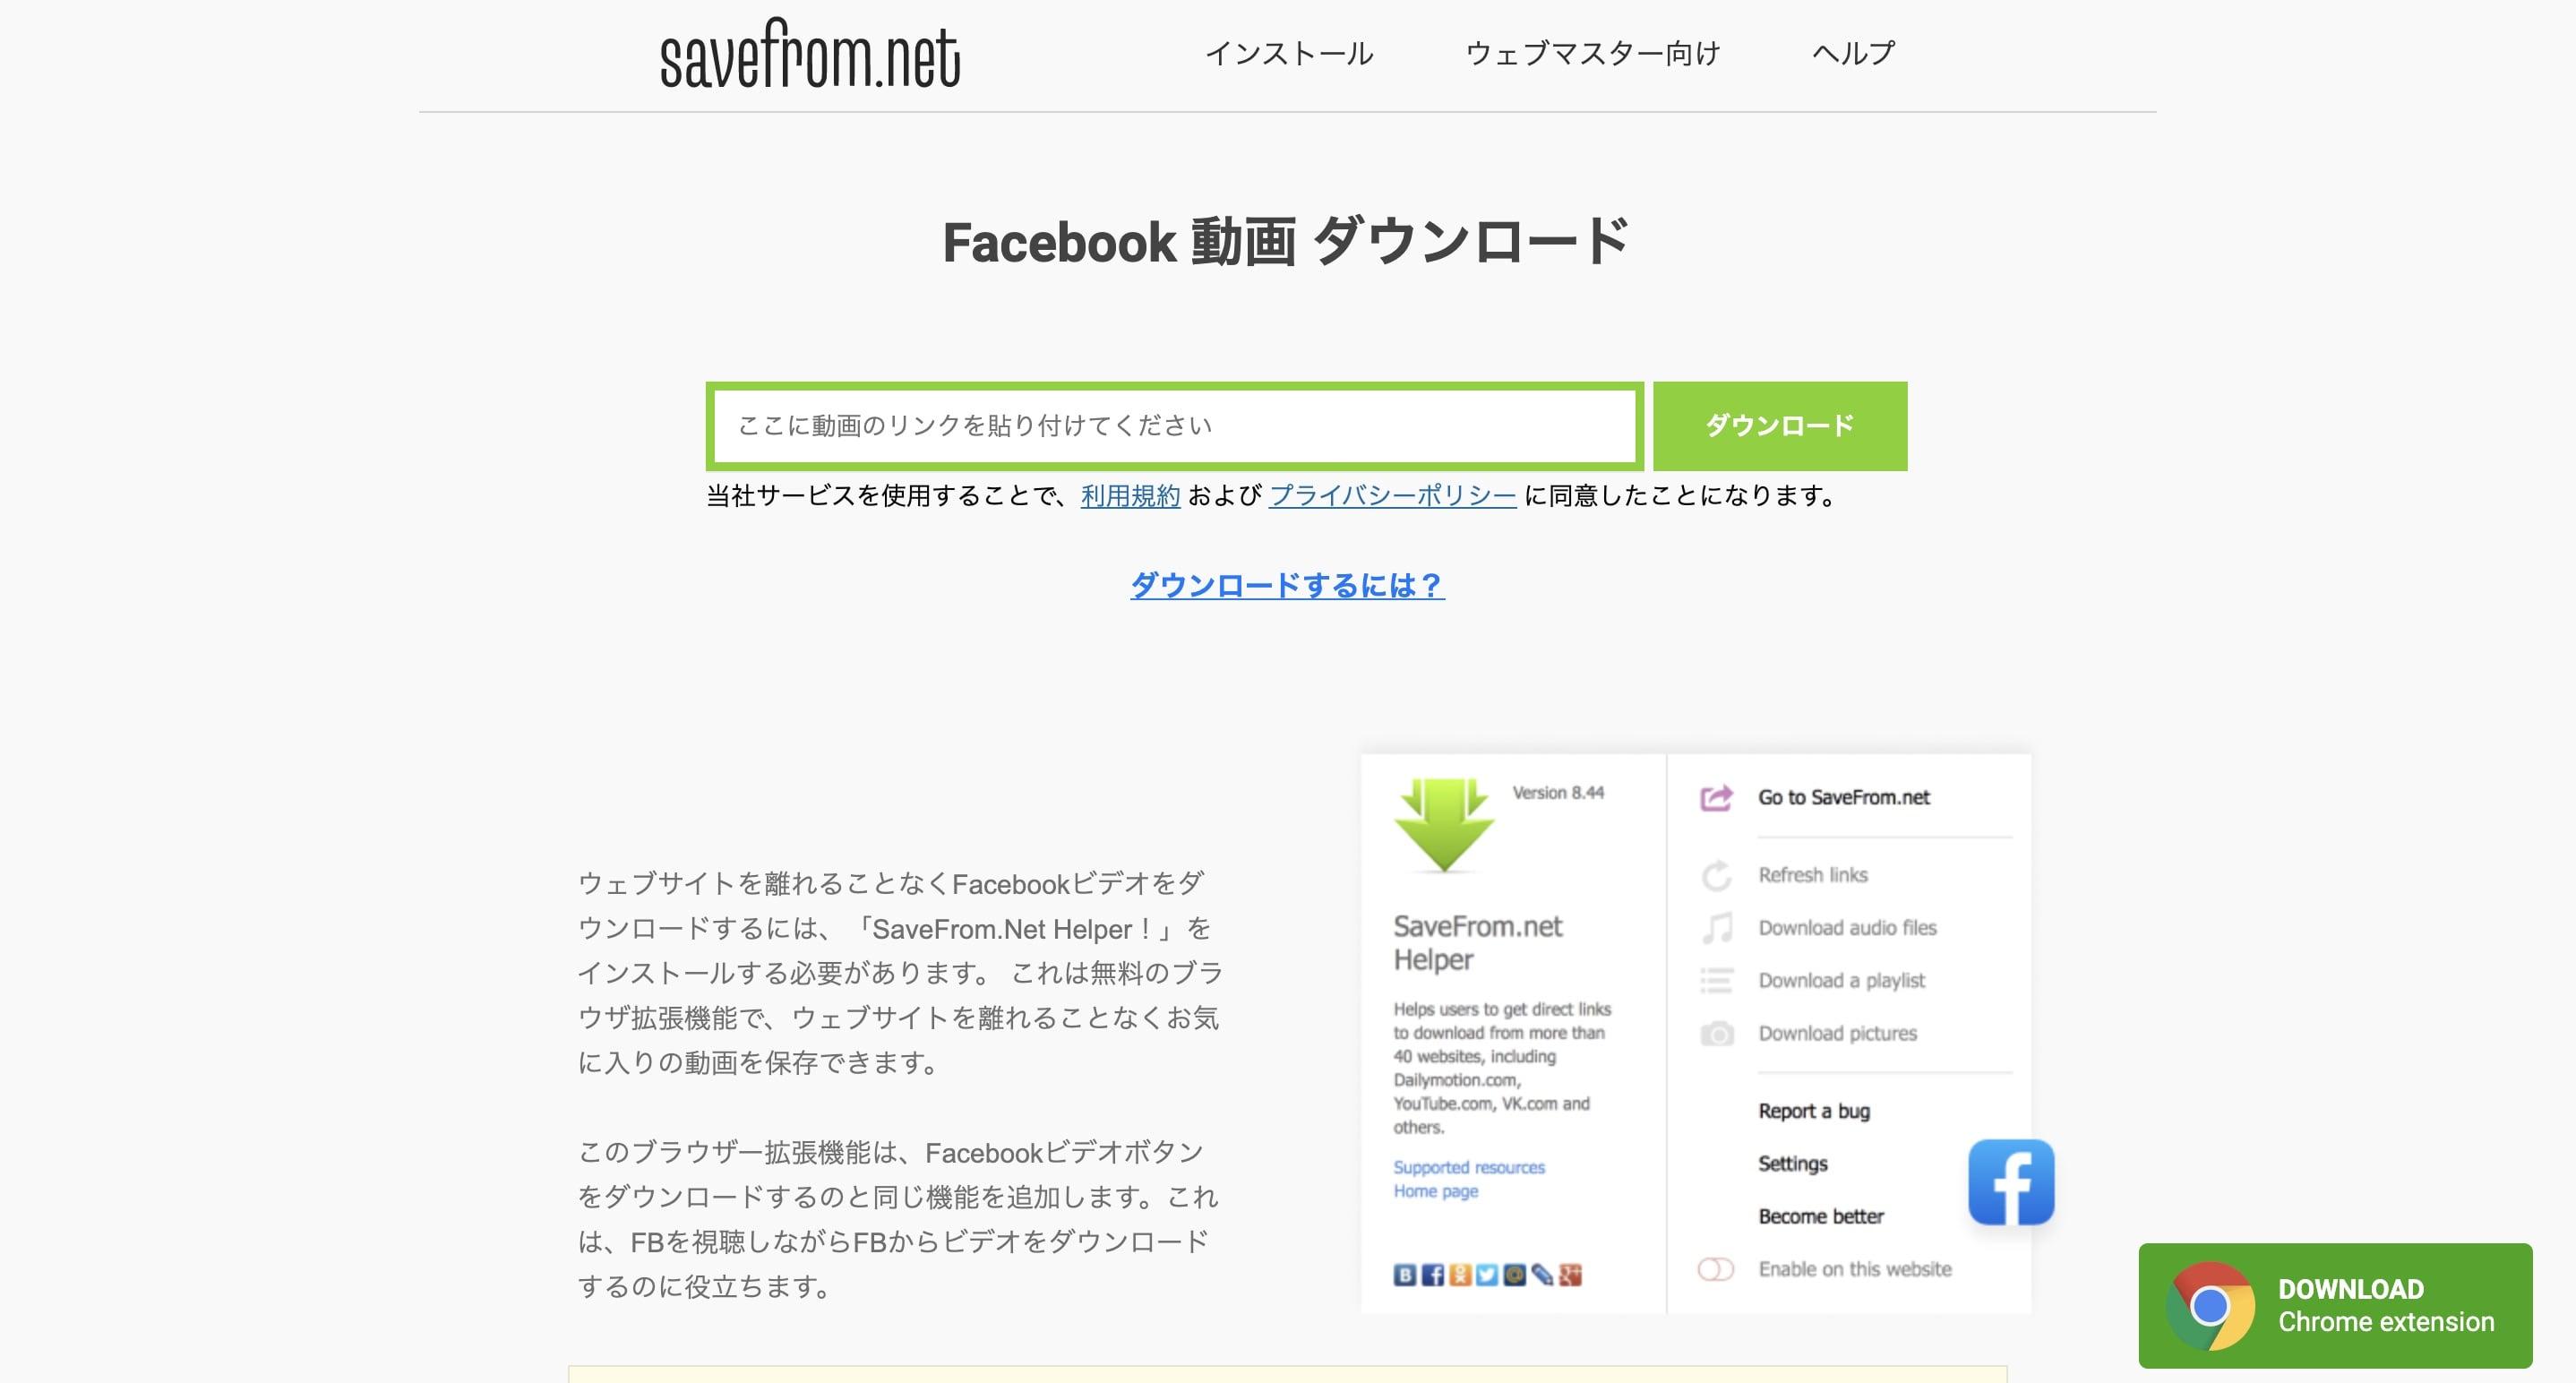 savefrom.netのキャプチャ